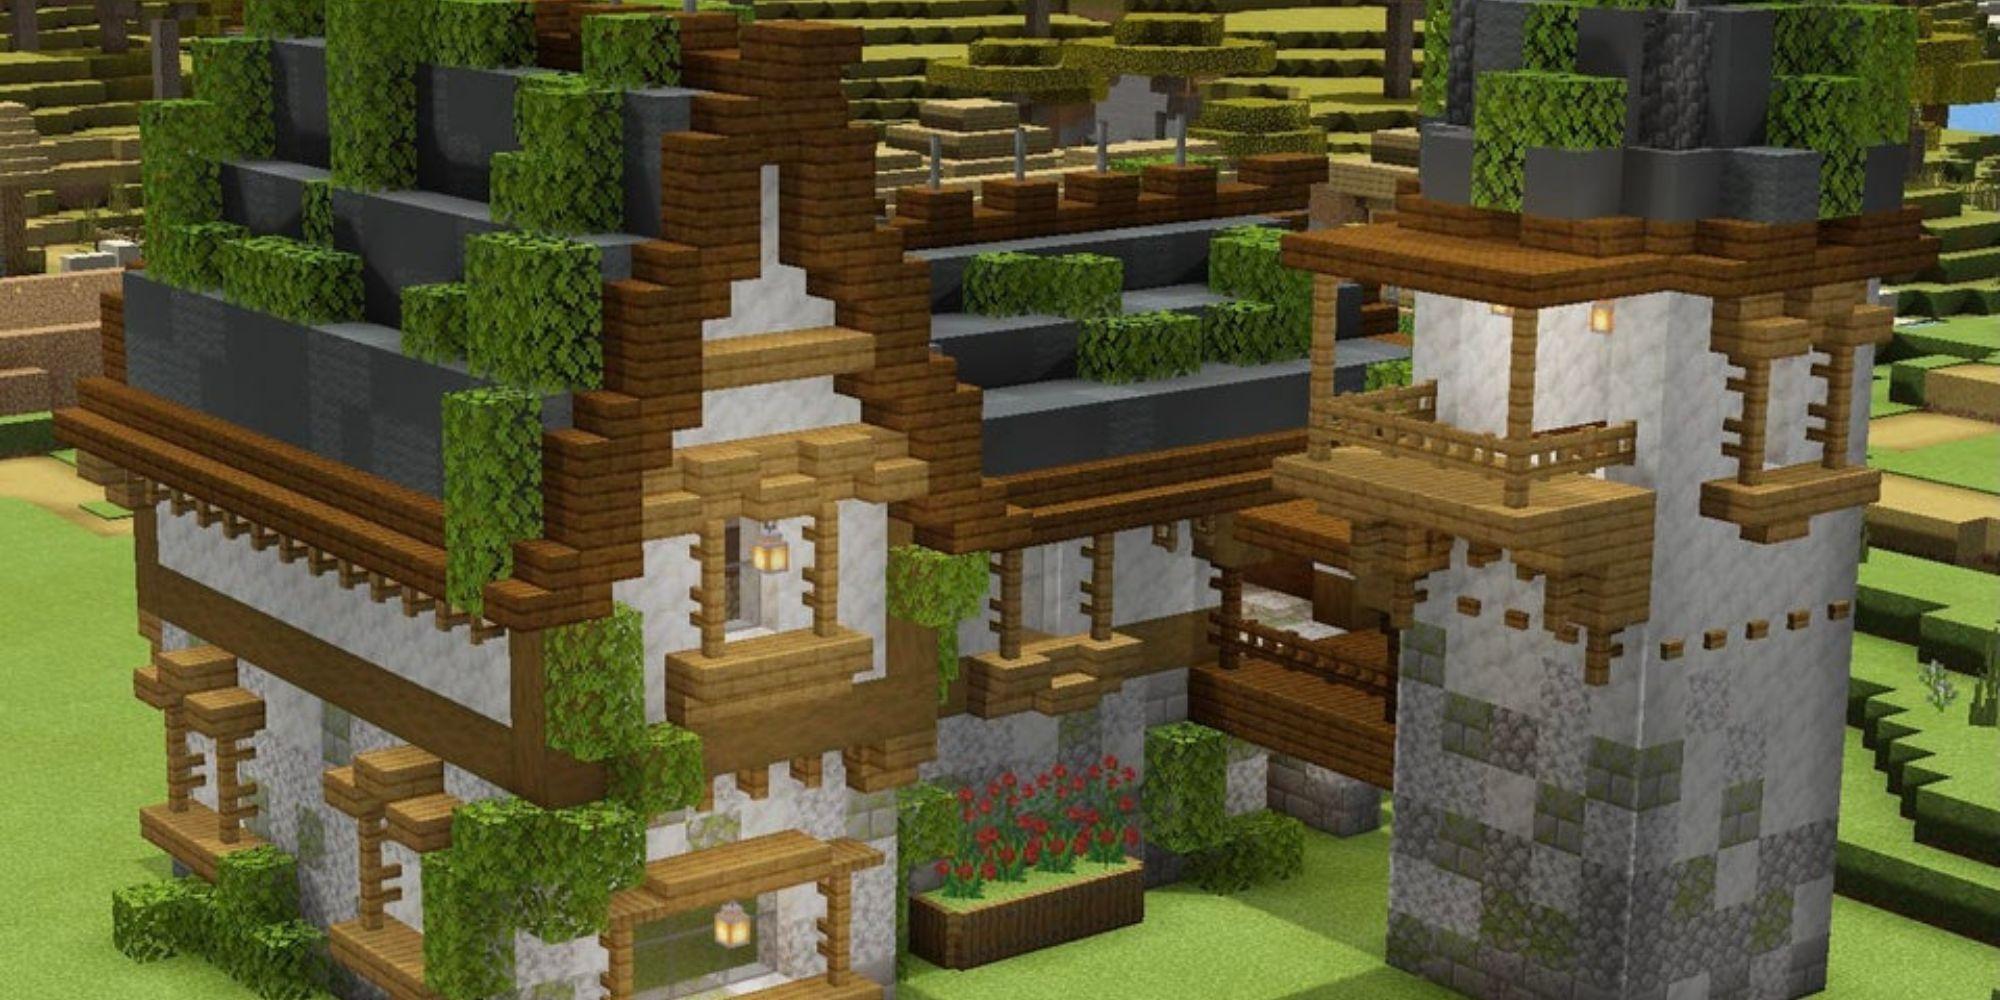 20 Brilliant Minecraft House Ideas   Game Rant